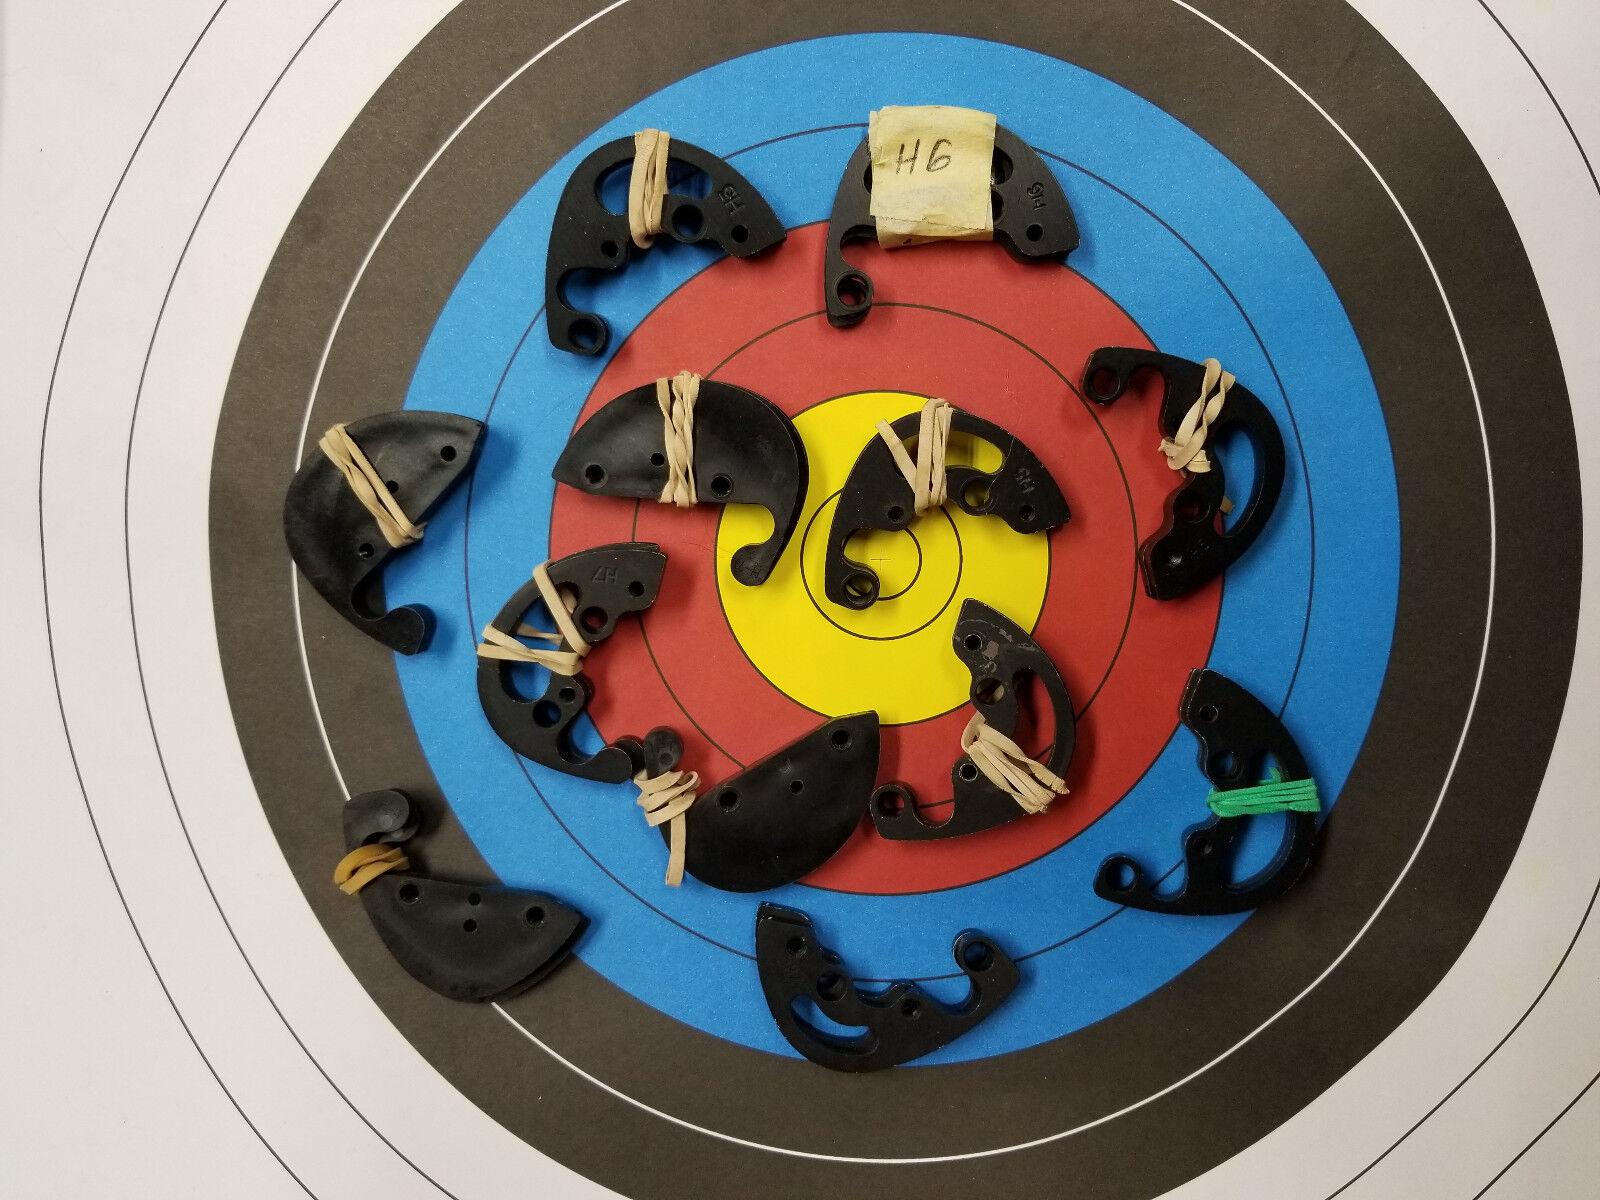 H & L Series Draw Length Modules  golden Eagle, Fred Bear & Jennings Archery